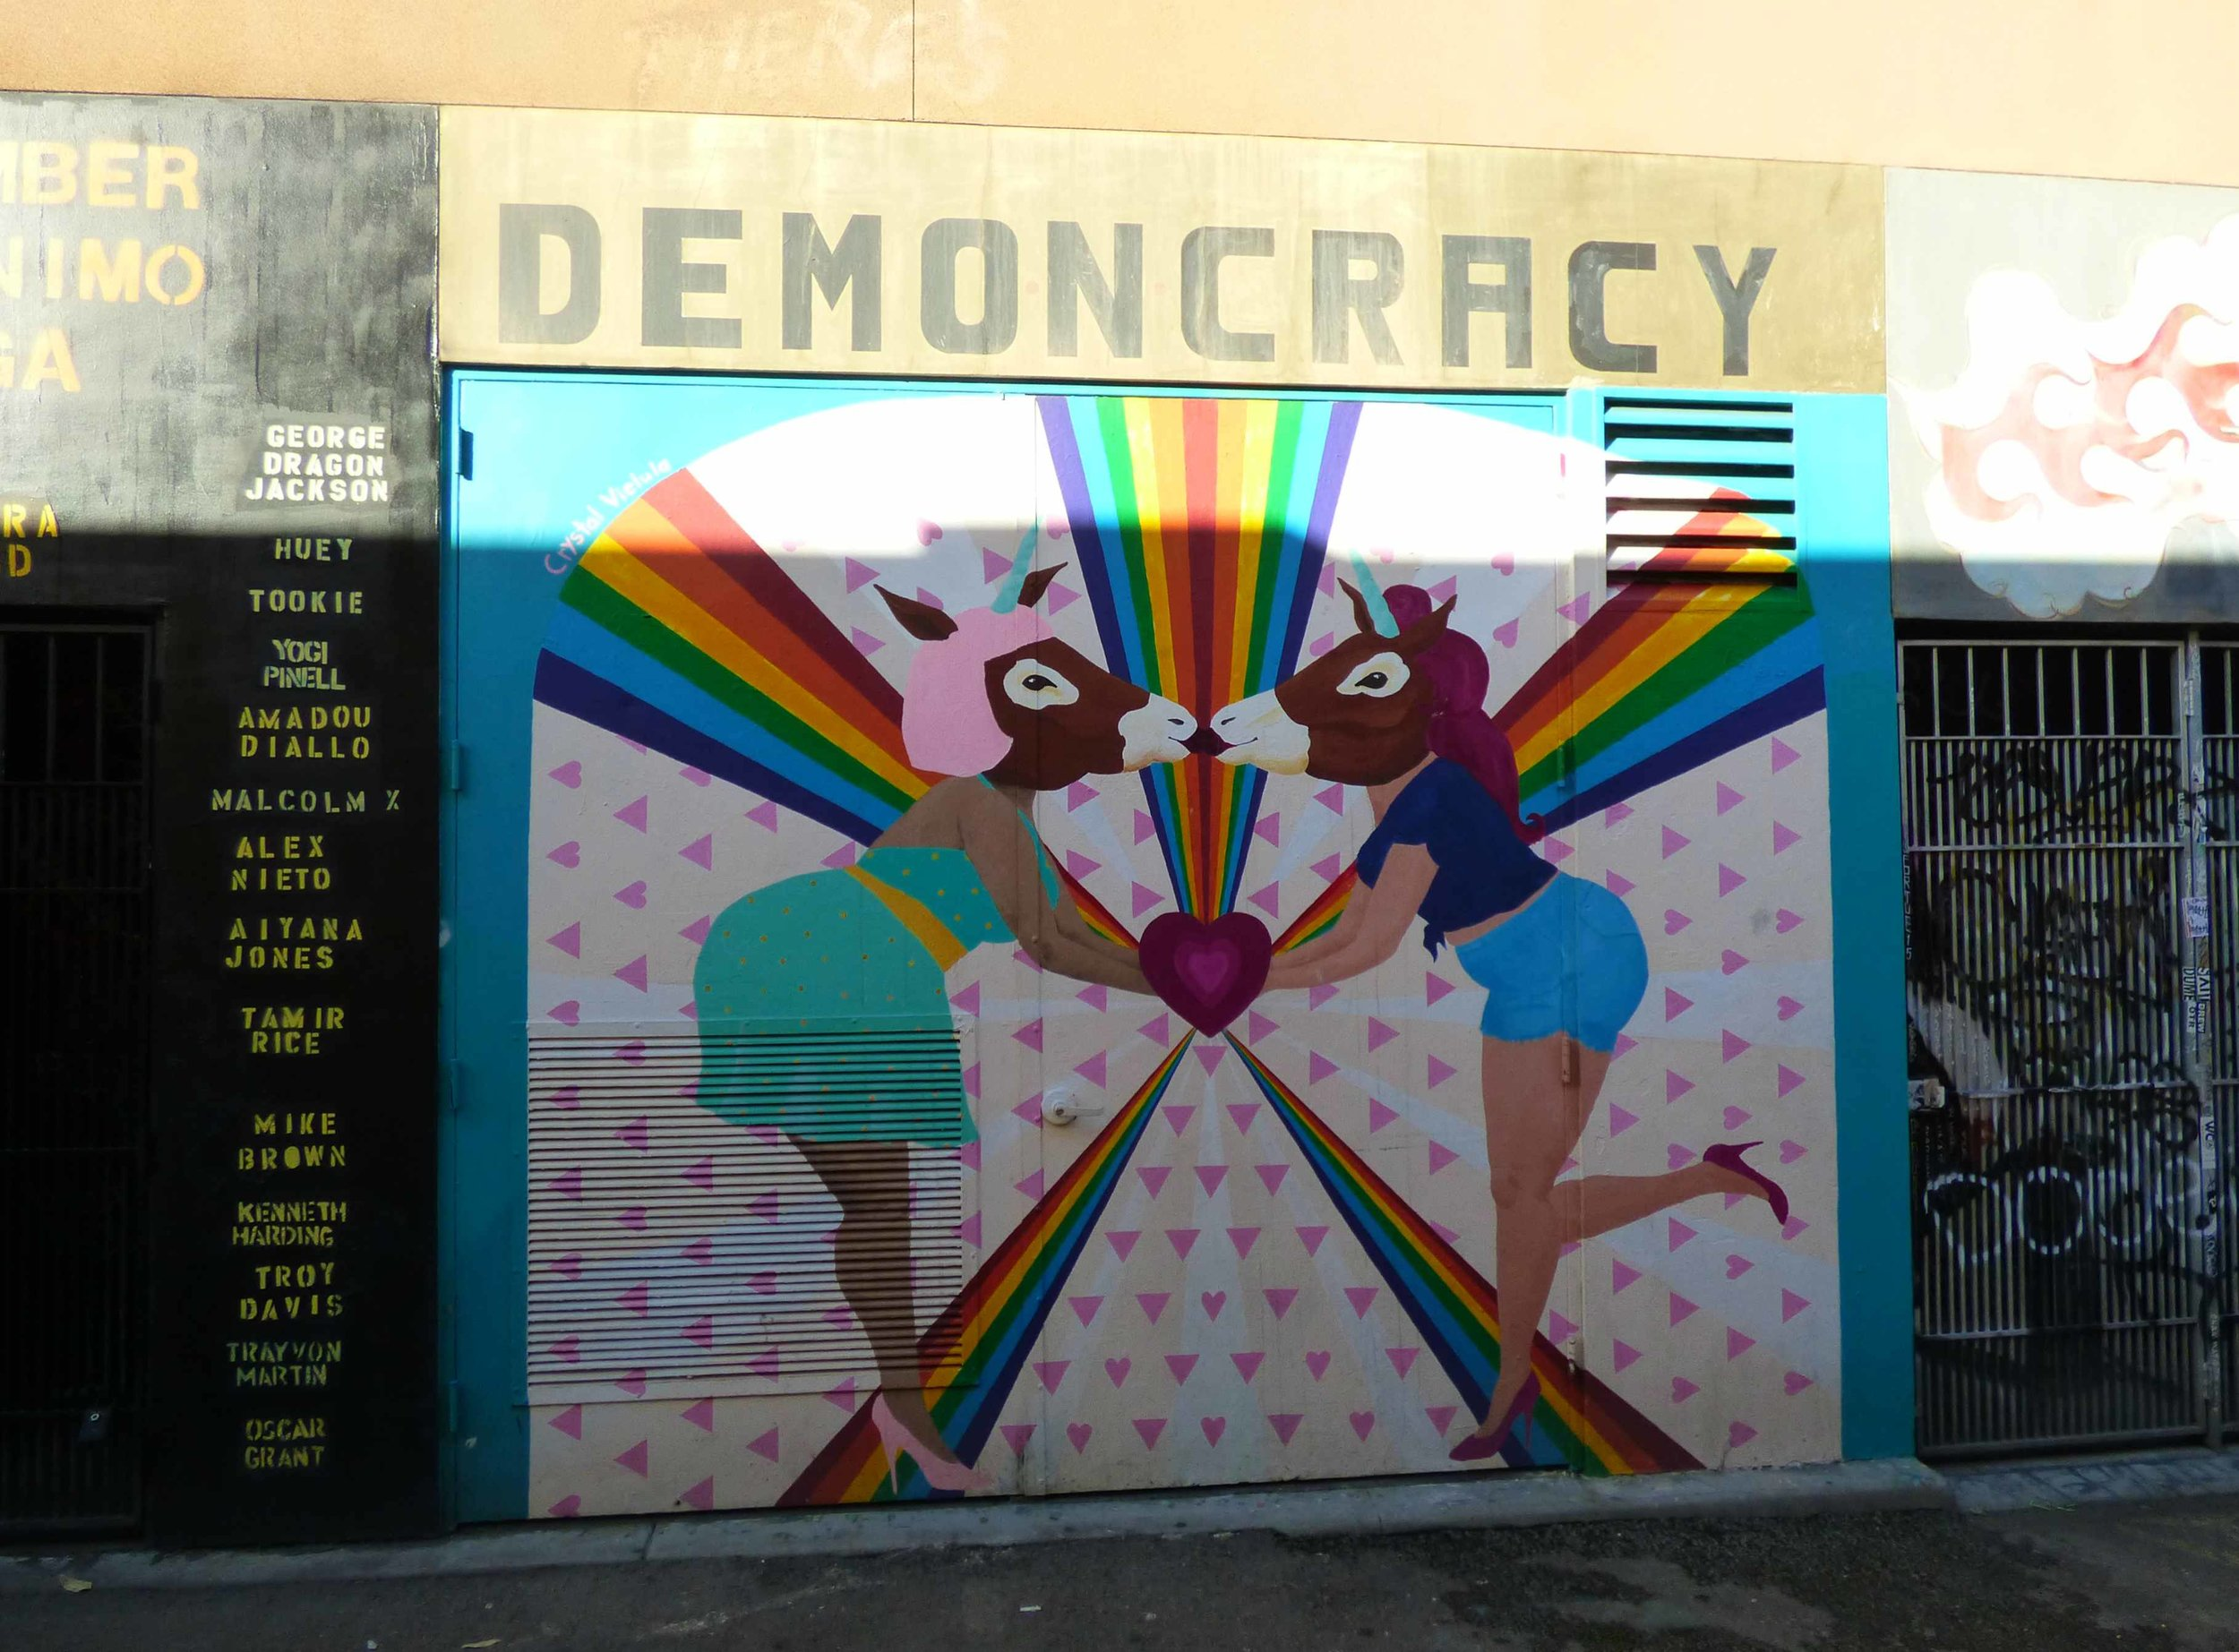 democrazy.jpg